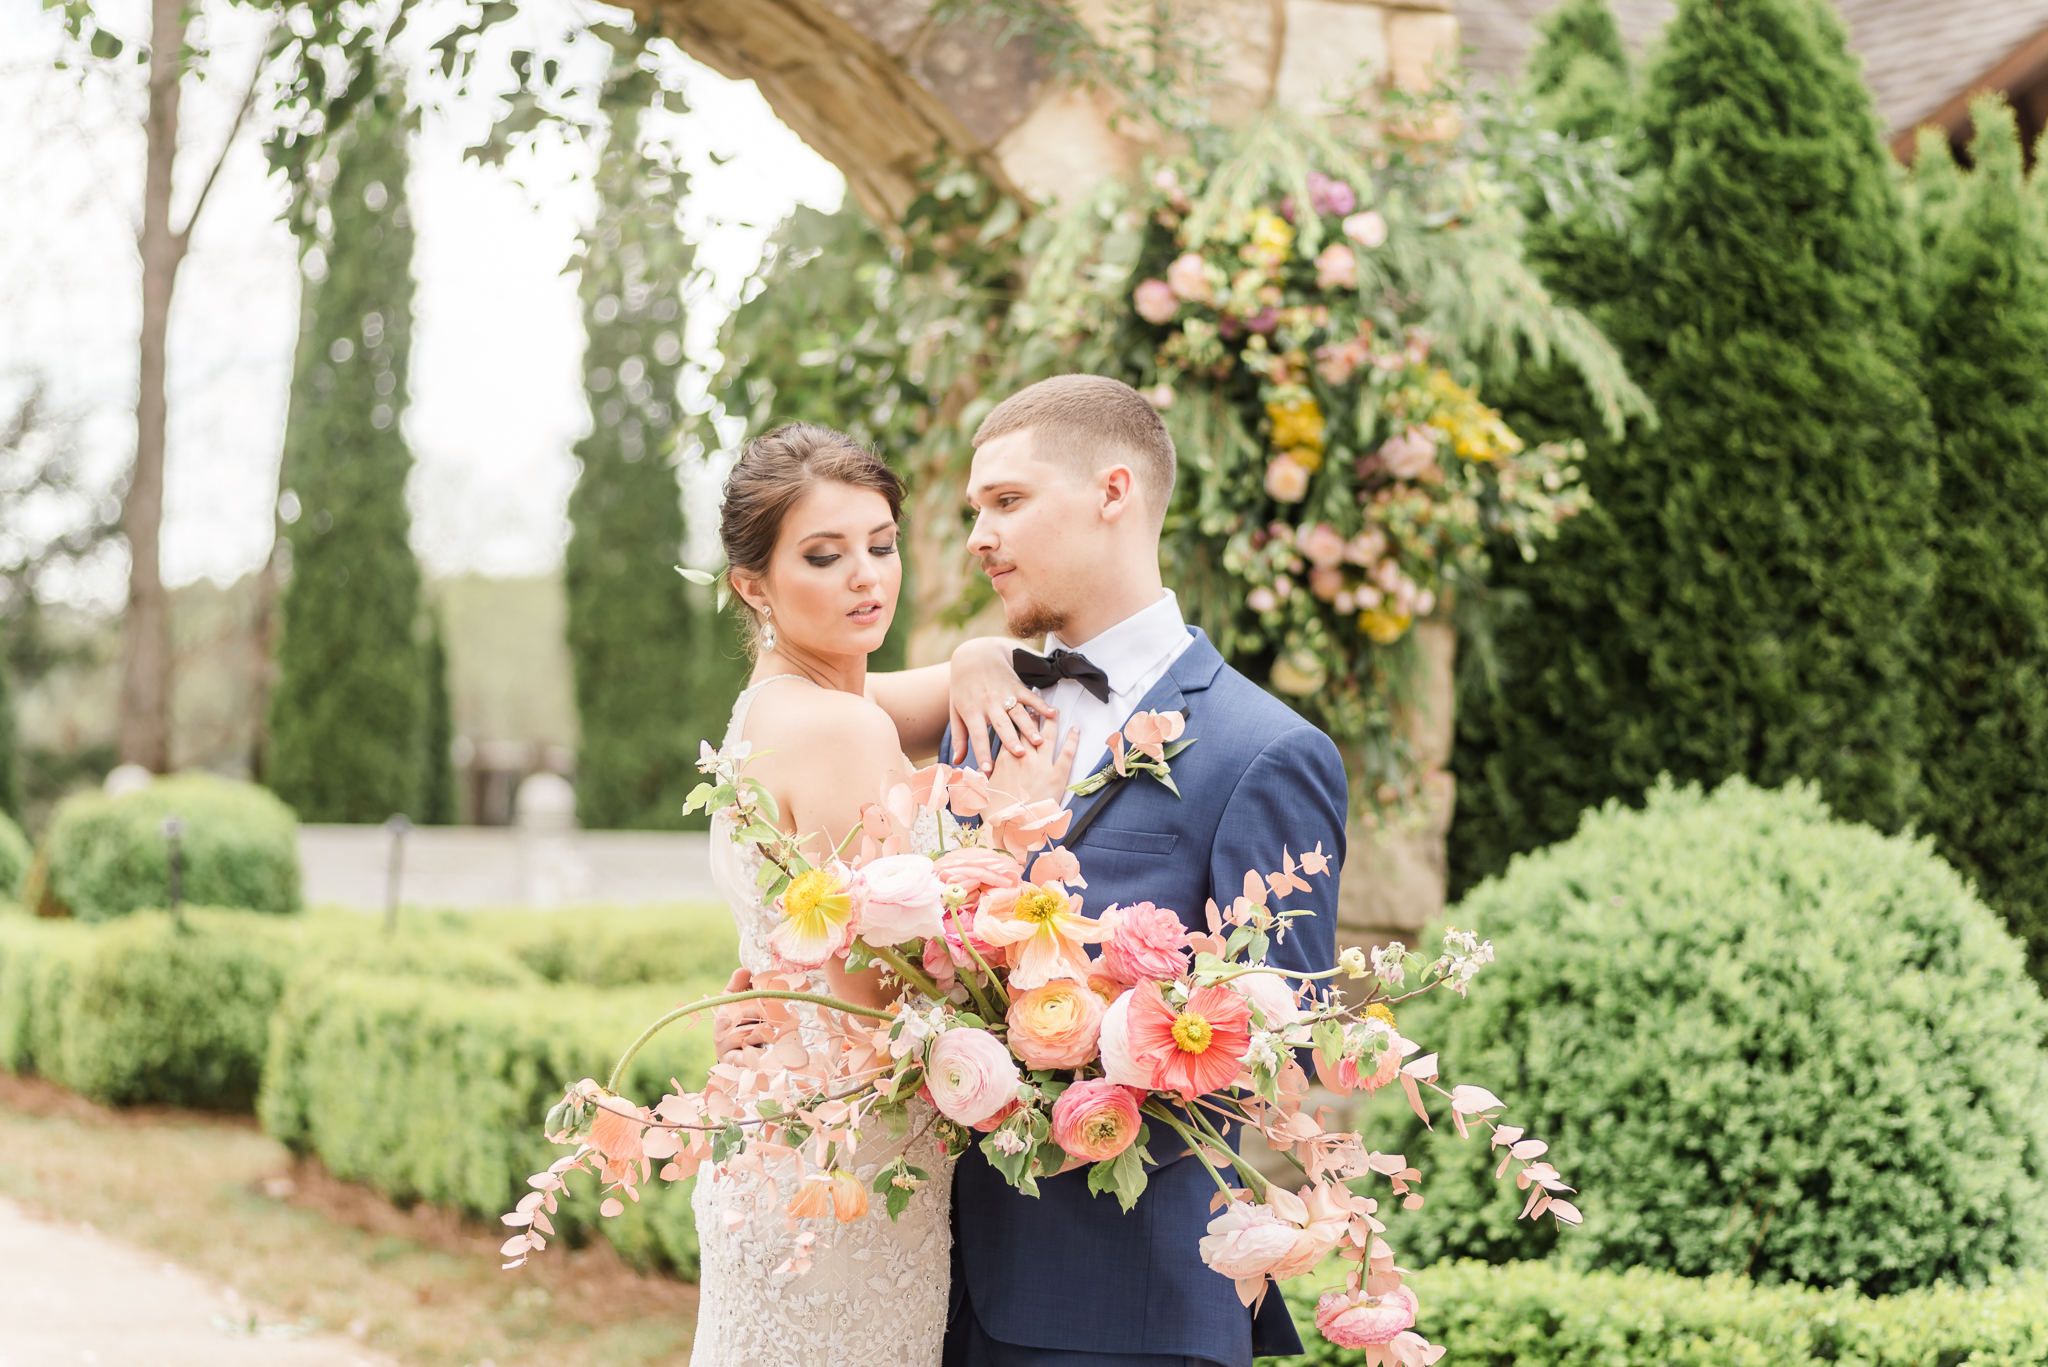 The Best Light and Airy Destination Wedding Photographers-5.jpg